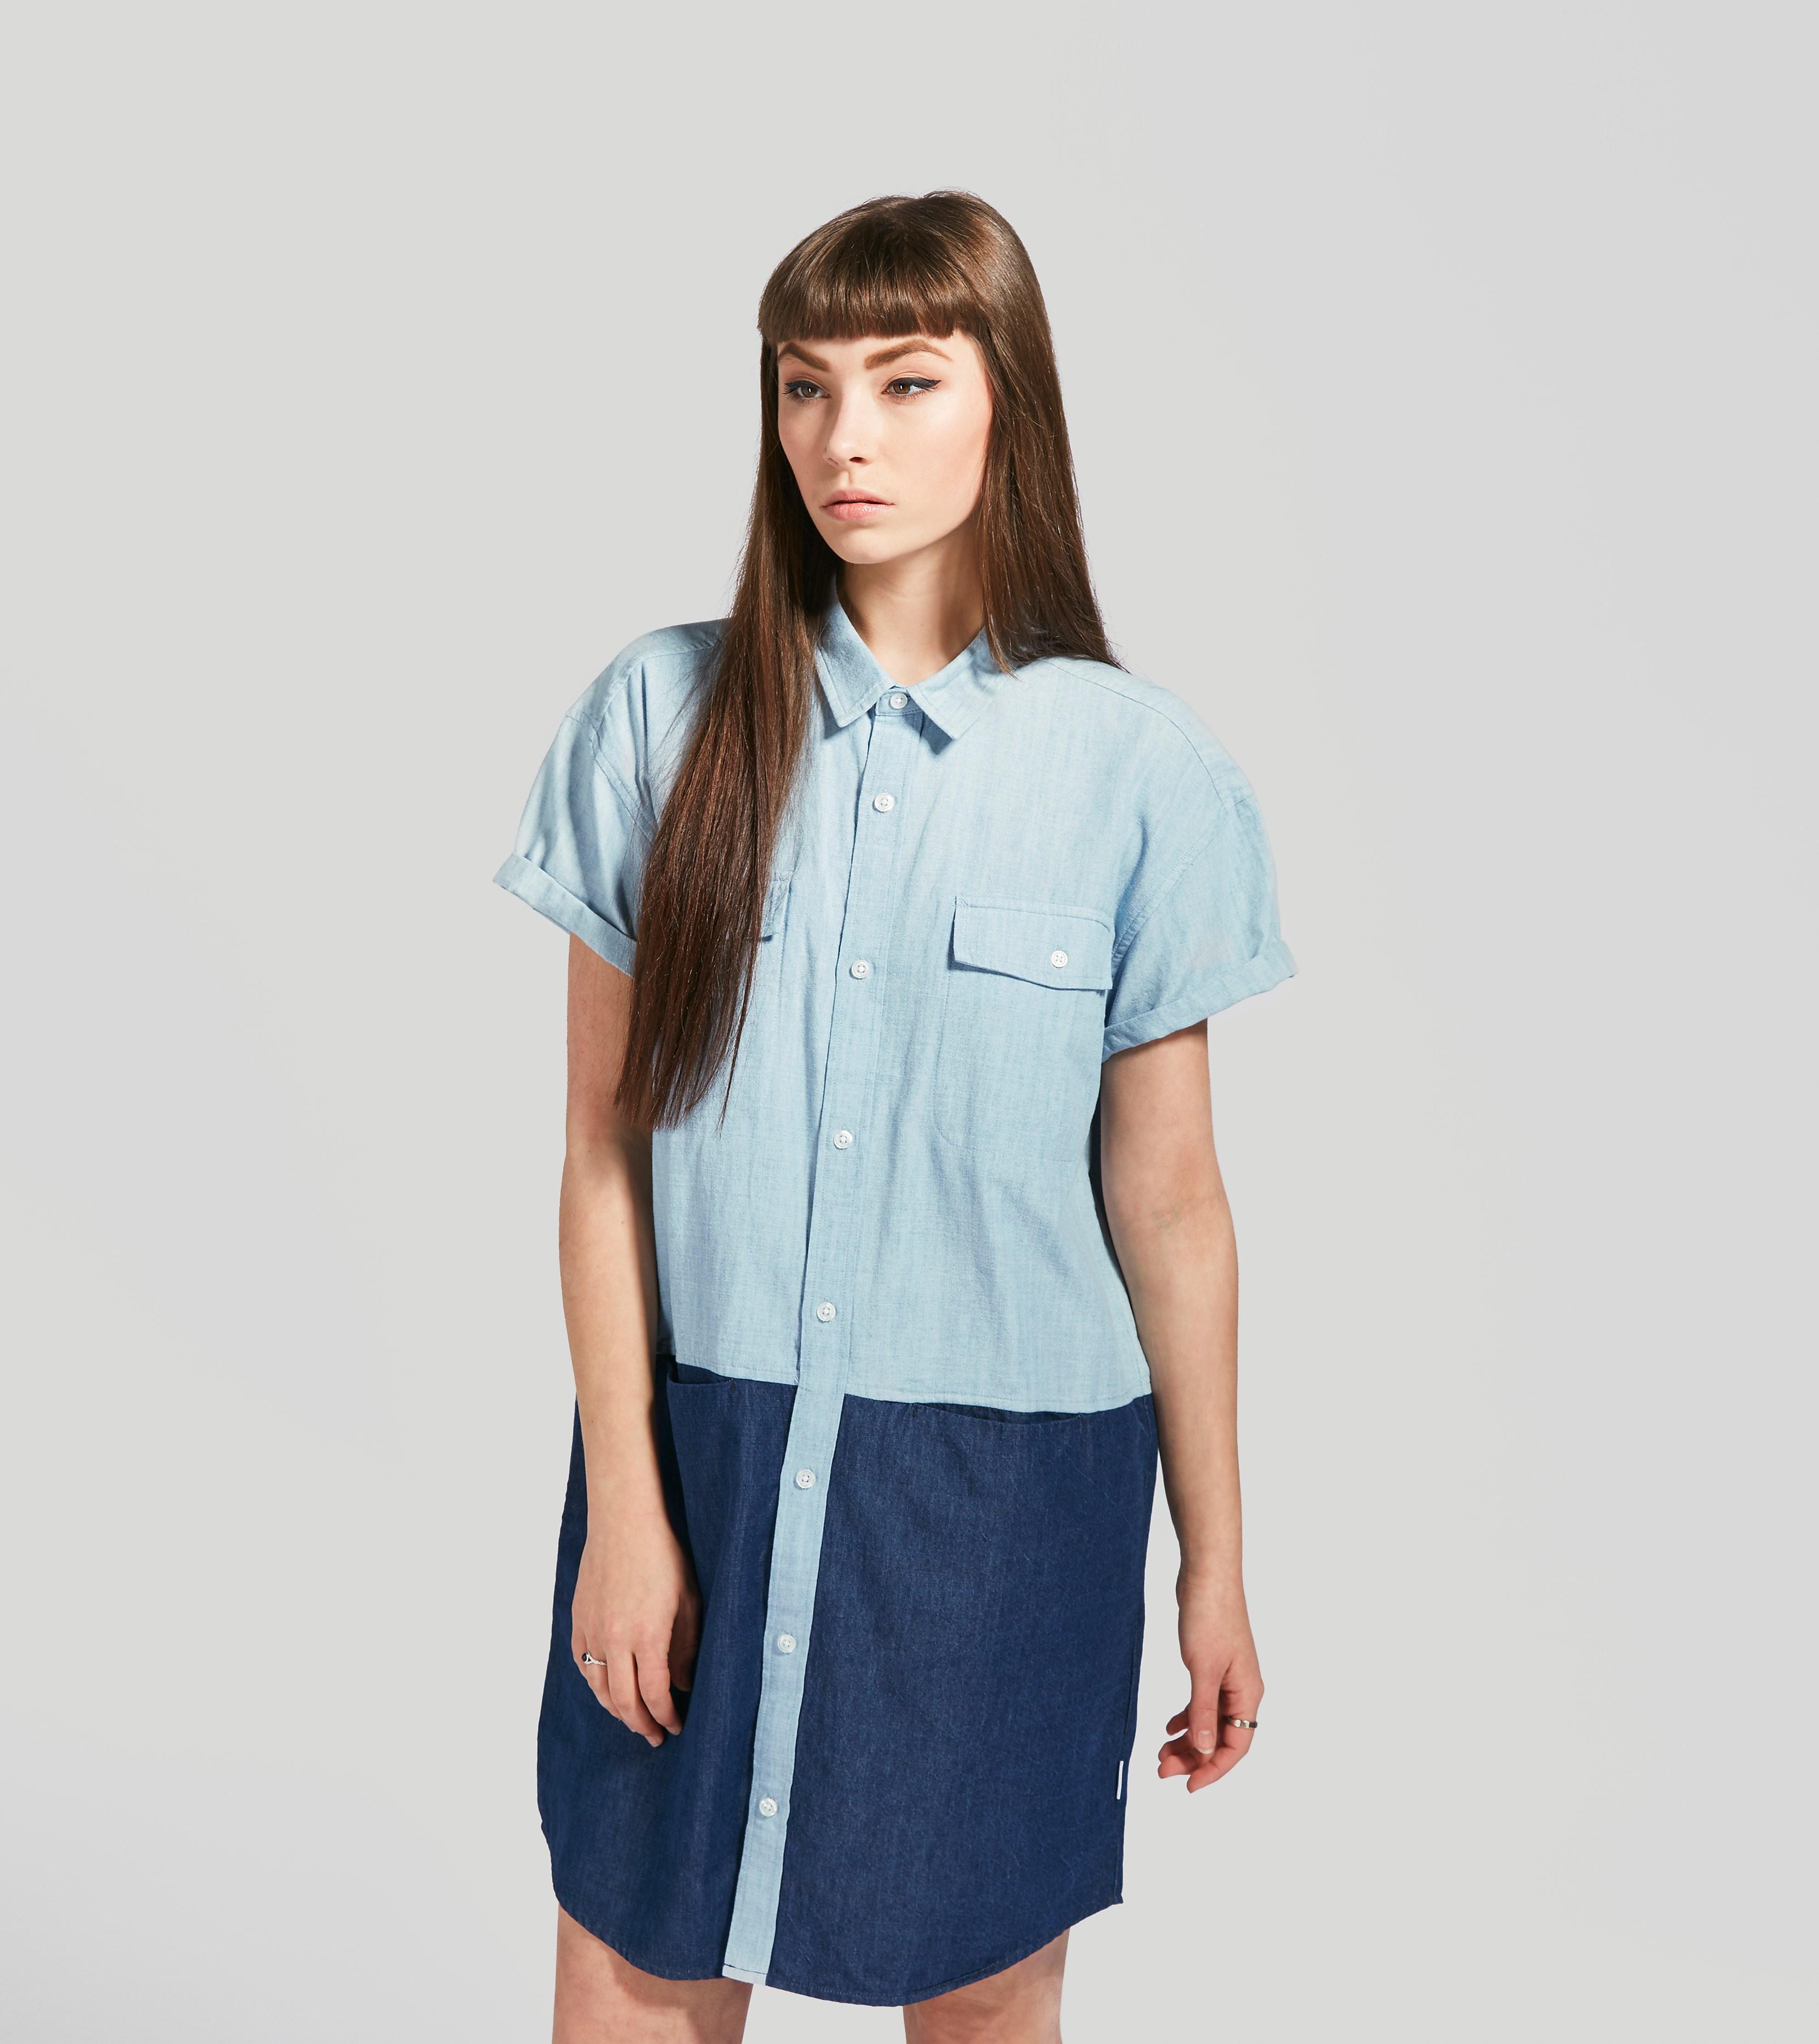 Carhartt WIP Cora Dress